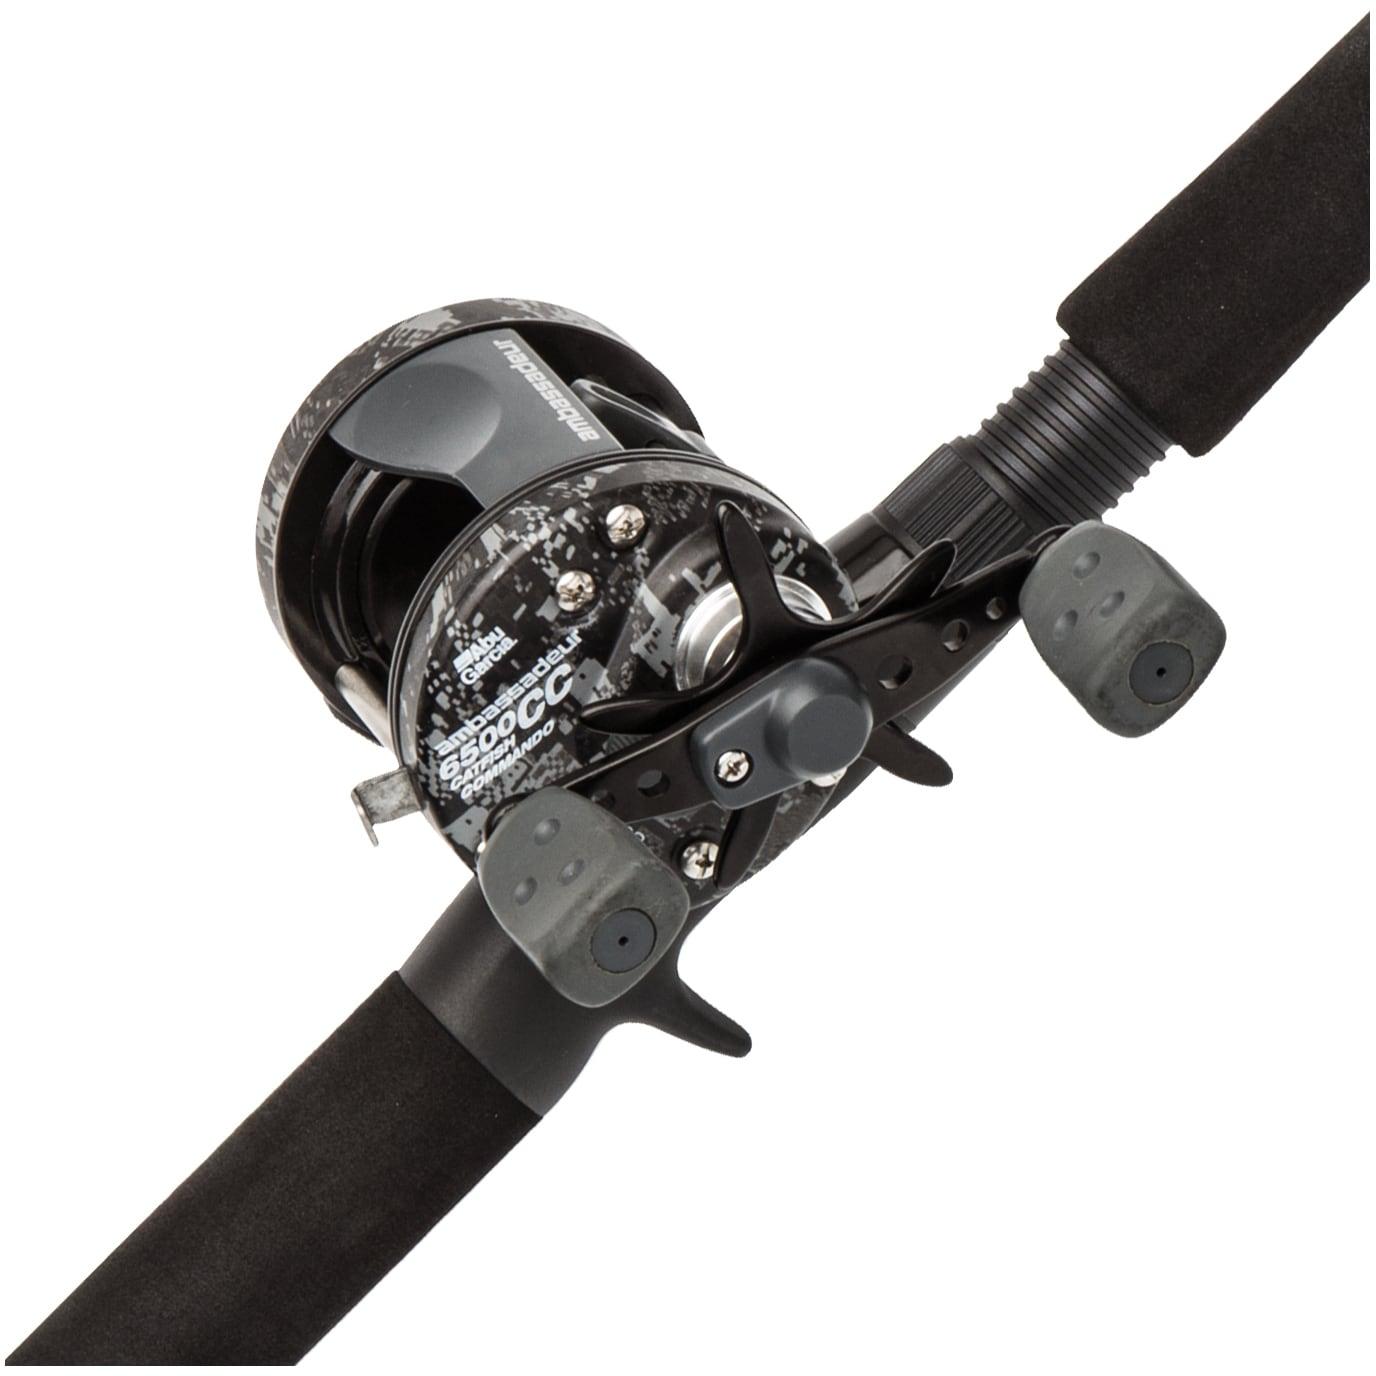 fishing rods \u0026 reels find great fishing deals shopping at overstockabu garcia catfish commando casting set